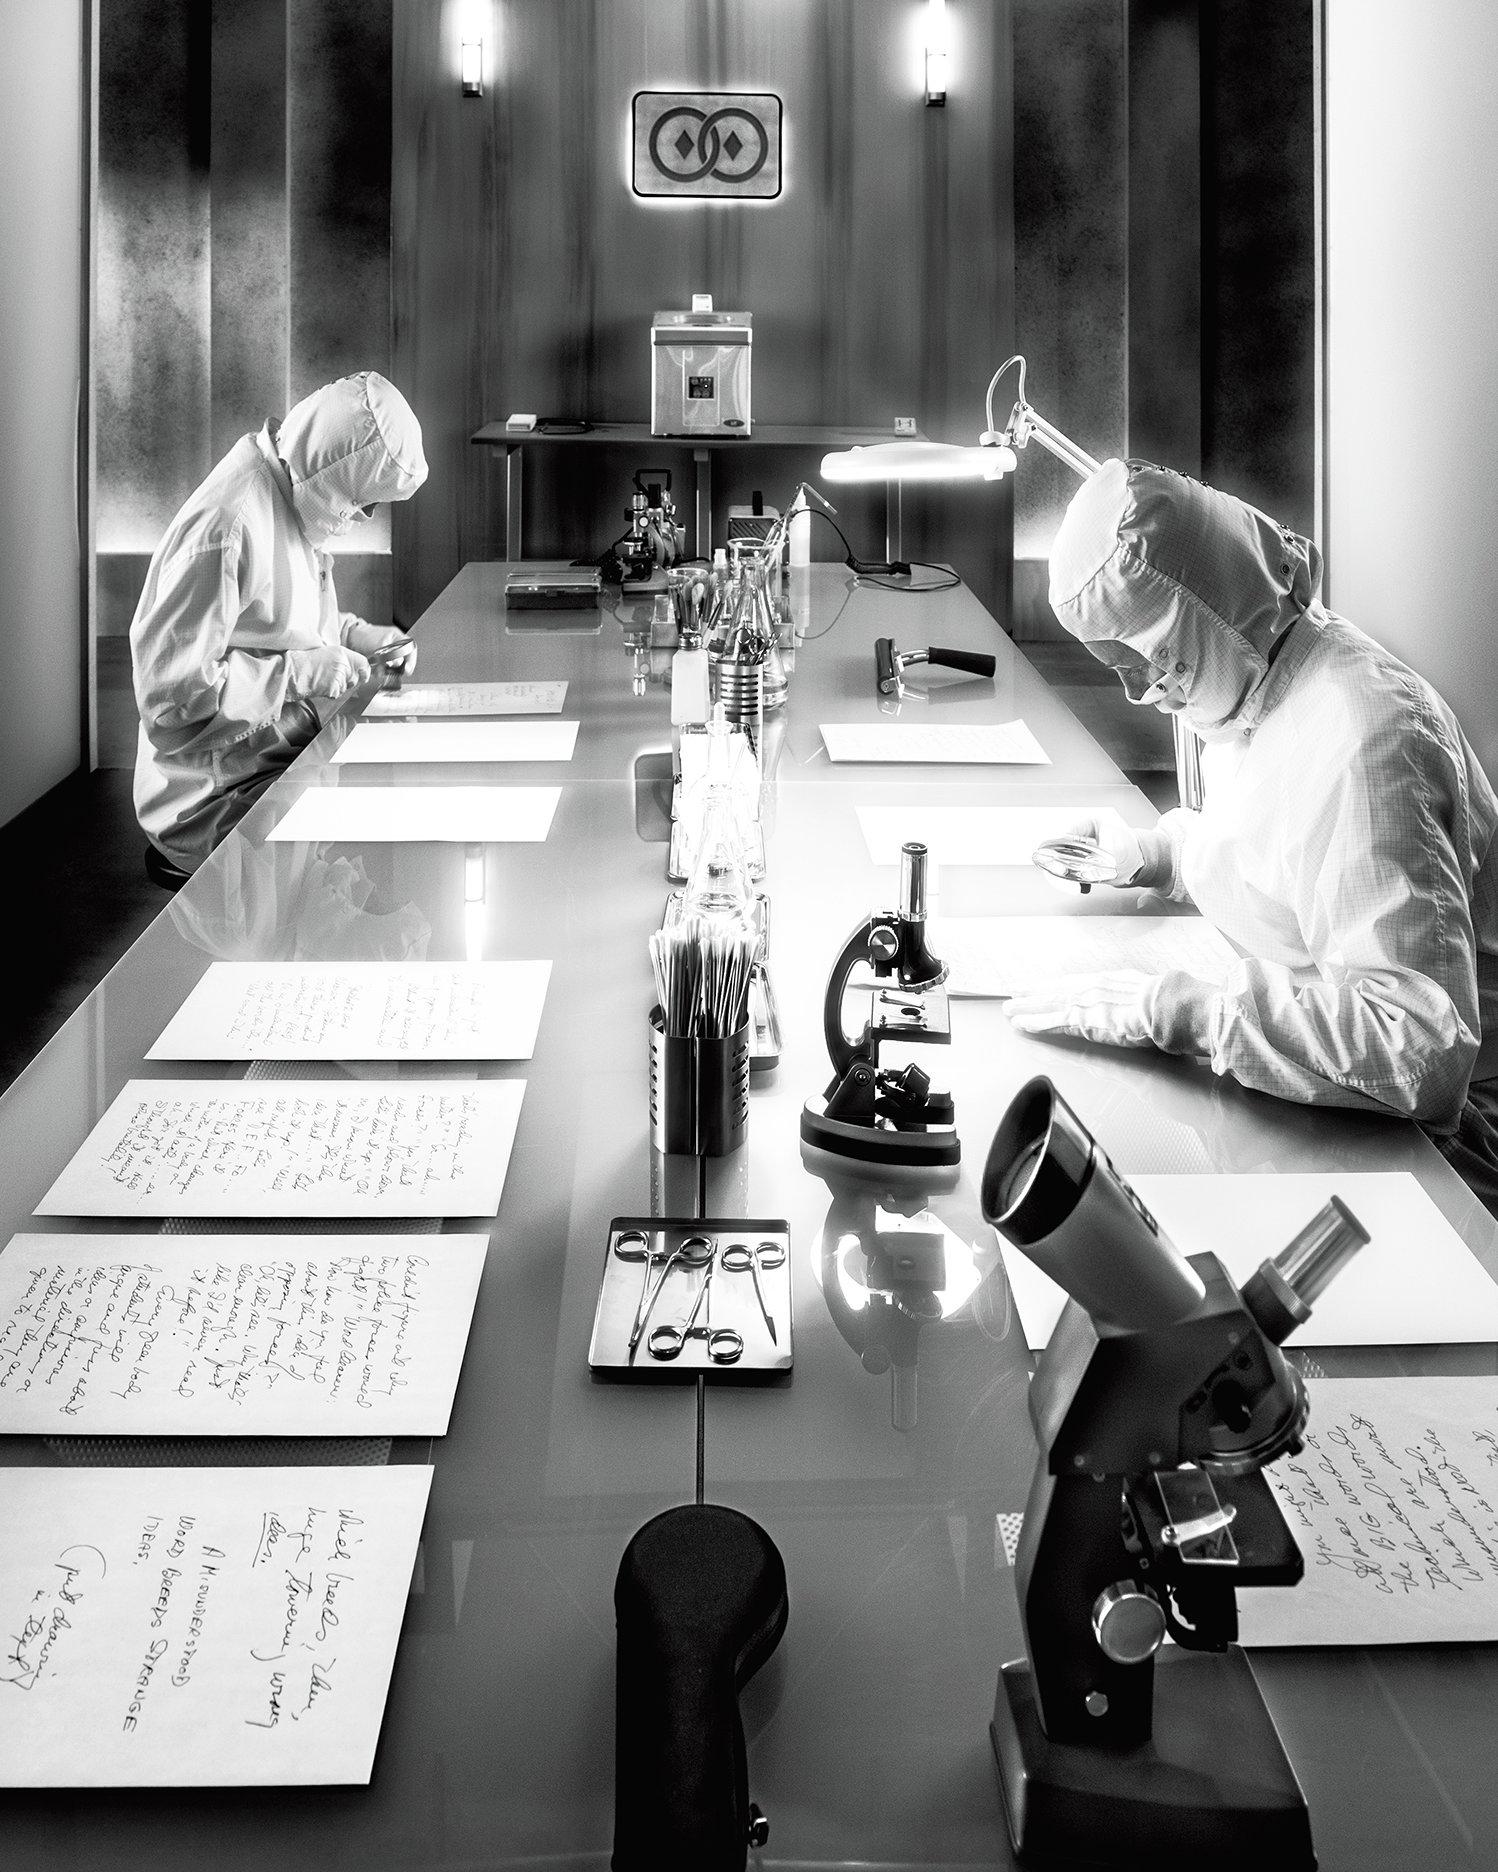 Scientology archival project